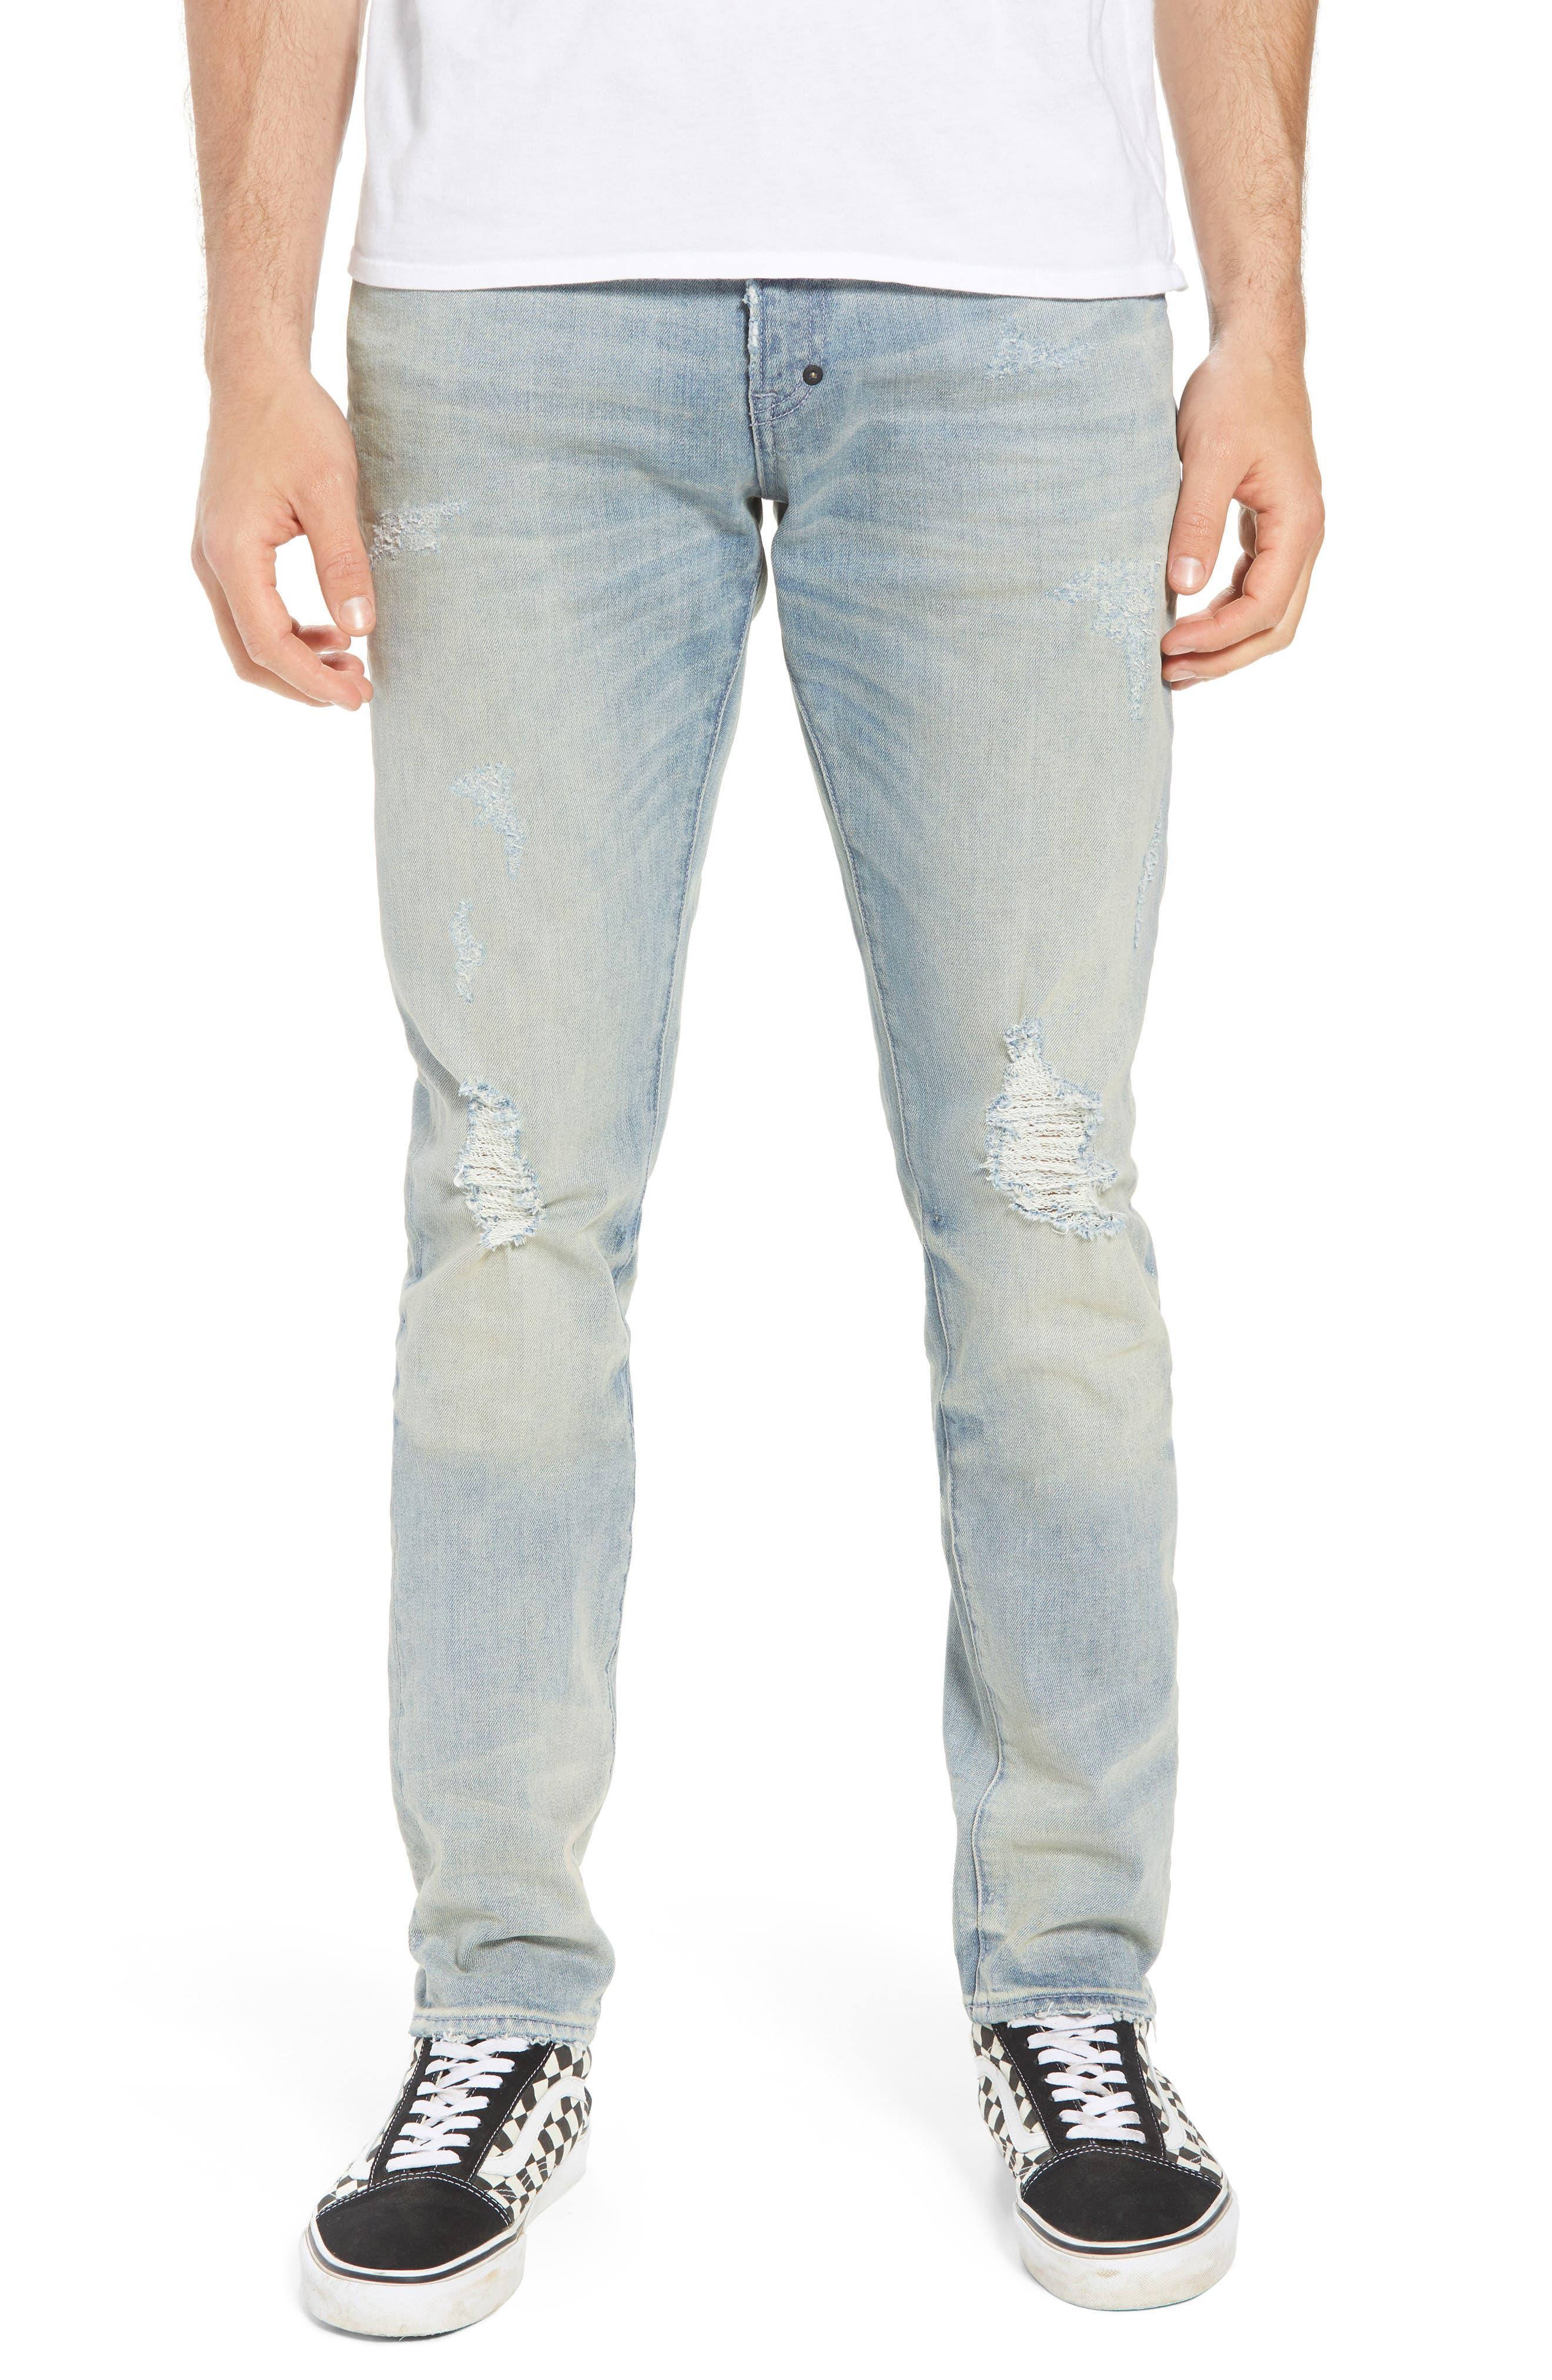 Windsor Slim Fit Jeans,                             Main thumbnail 1, color,                             LANGUID